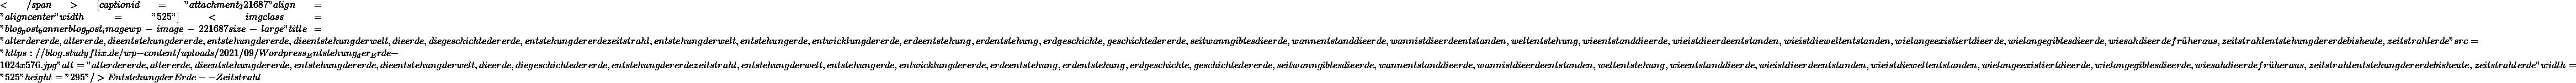 "</span> [caption id=""attachment_221687"" align=""aligncenter"" width=""525""]<img class=""blog_post_banner blog_post_image wp-image-221687 size-large"" title=""alter der erde, alter erde, die entstehung der erde, entstehung der erde, die entstehung der welt, die erde, die geschichte der erde, entstehung der erde zeitstrahl, entstehung der welt, entstehung erde, entwicklung der erde, erde entstehung, erdentstehung, erdgeschichte, geschichte der erde, seit wann gibt es die erde, wann entstand die erde, wann ist die erde entstanden, weltentstehung, wie entstand die erde, wie ist die erde entstanden, wie ist die welt entstanden, wie lange existiert die erde, wie lange gibt es die erde, wie sah die erde früher aus, zeitstrahl entstehung der erde bis heute, zeitstrahl erde"" src=""https://blog.studyflix.de/wp-content/uploads/2021/09/Wordpress_Entstehung_der_Erde-1024x576.jpg"" alt=""alter der erde, alter erde, die entstehung der erde, entstehung der erde, die entstehung der welt, die erde, die geschichte der erde, entstehung der erde zeitstrahl, entstehung der welt, entstehung erde, entwicklung der erde, erde entstehung, erdentstehung, erdgeschichte, geschichte der erde, seit wann gibt es die erde, wann entstand die erde, wann ist die erde entstanden, weltentstehung, wie entstand die erde, wie ist die erde entstanden, wie ist die welt entstanden, wie lange existiert die erde, wie lange gibt es die erde, wie sah die erde früher aus, zeitstrahl entstehung der erde bis heute, zeitstrahl erde"" width=""525"" height=""295"" /> Entstehung der Erde -- Zeitstrahl"